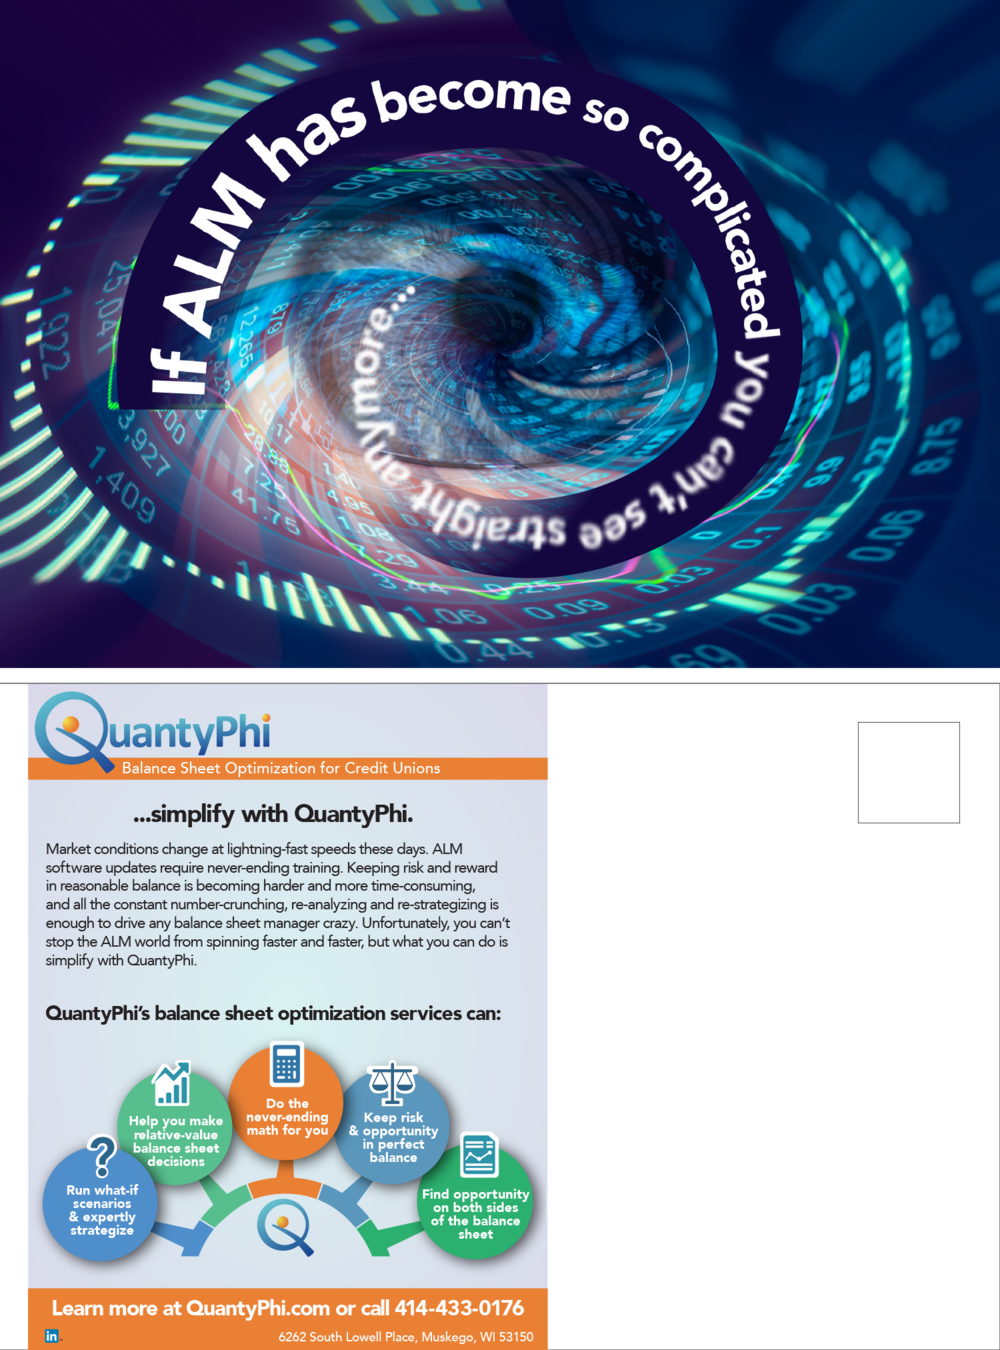 QuantyPhi_Postcards_DizzyingALM_101017.png